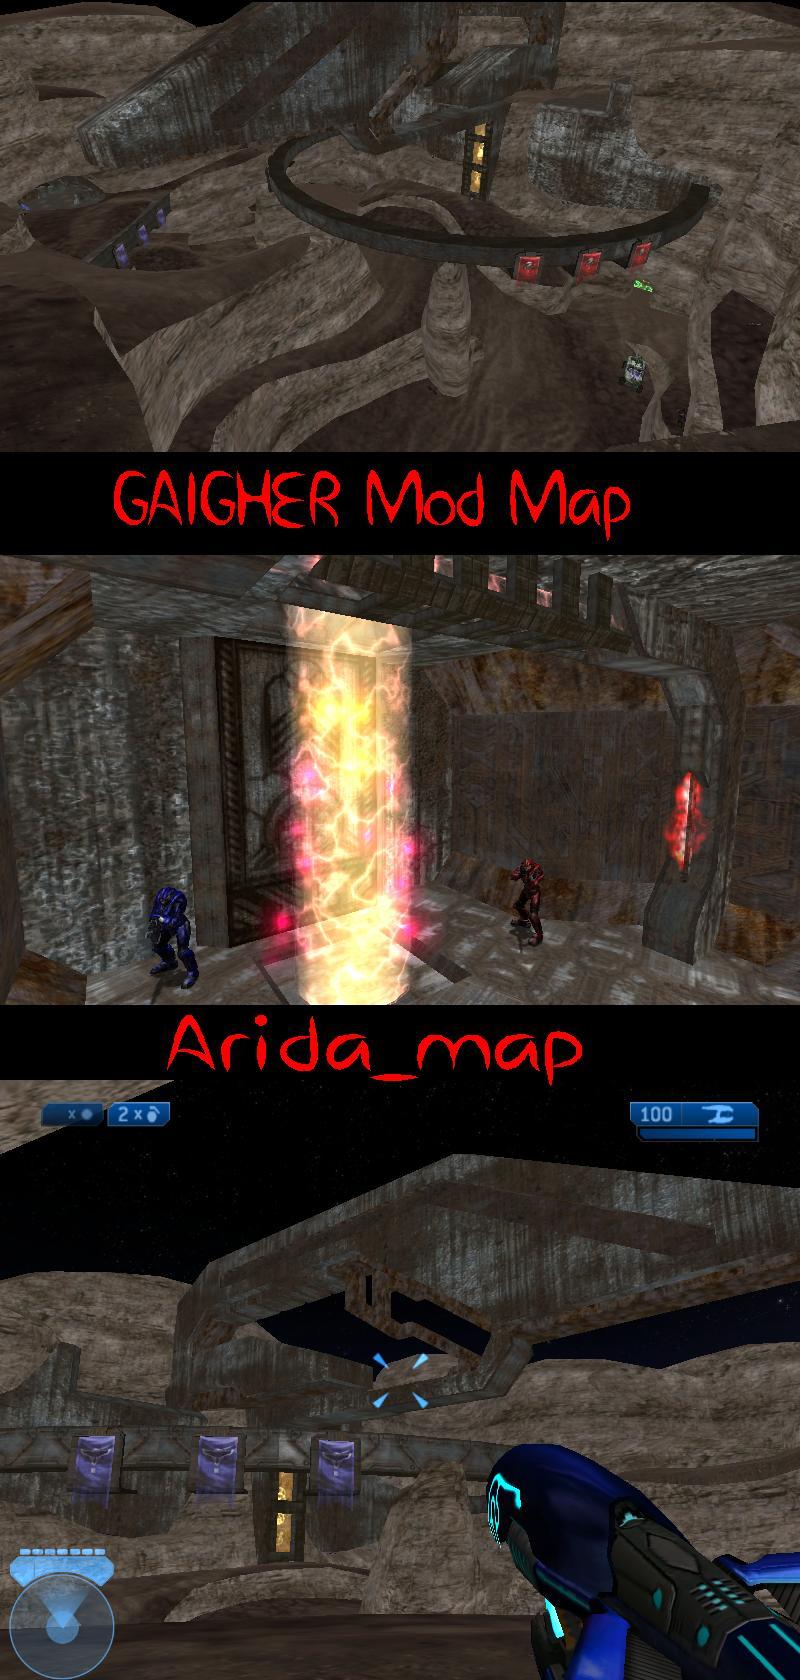 Arida_map Arida maphaloce map halo ce<br />maphalo halomap carte cartes cr&eacute;ation GAIGHER mod